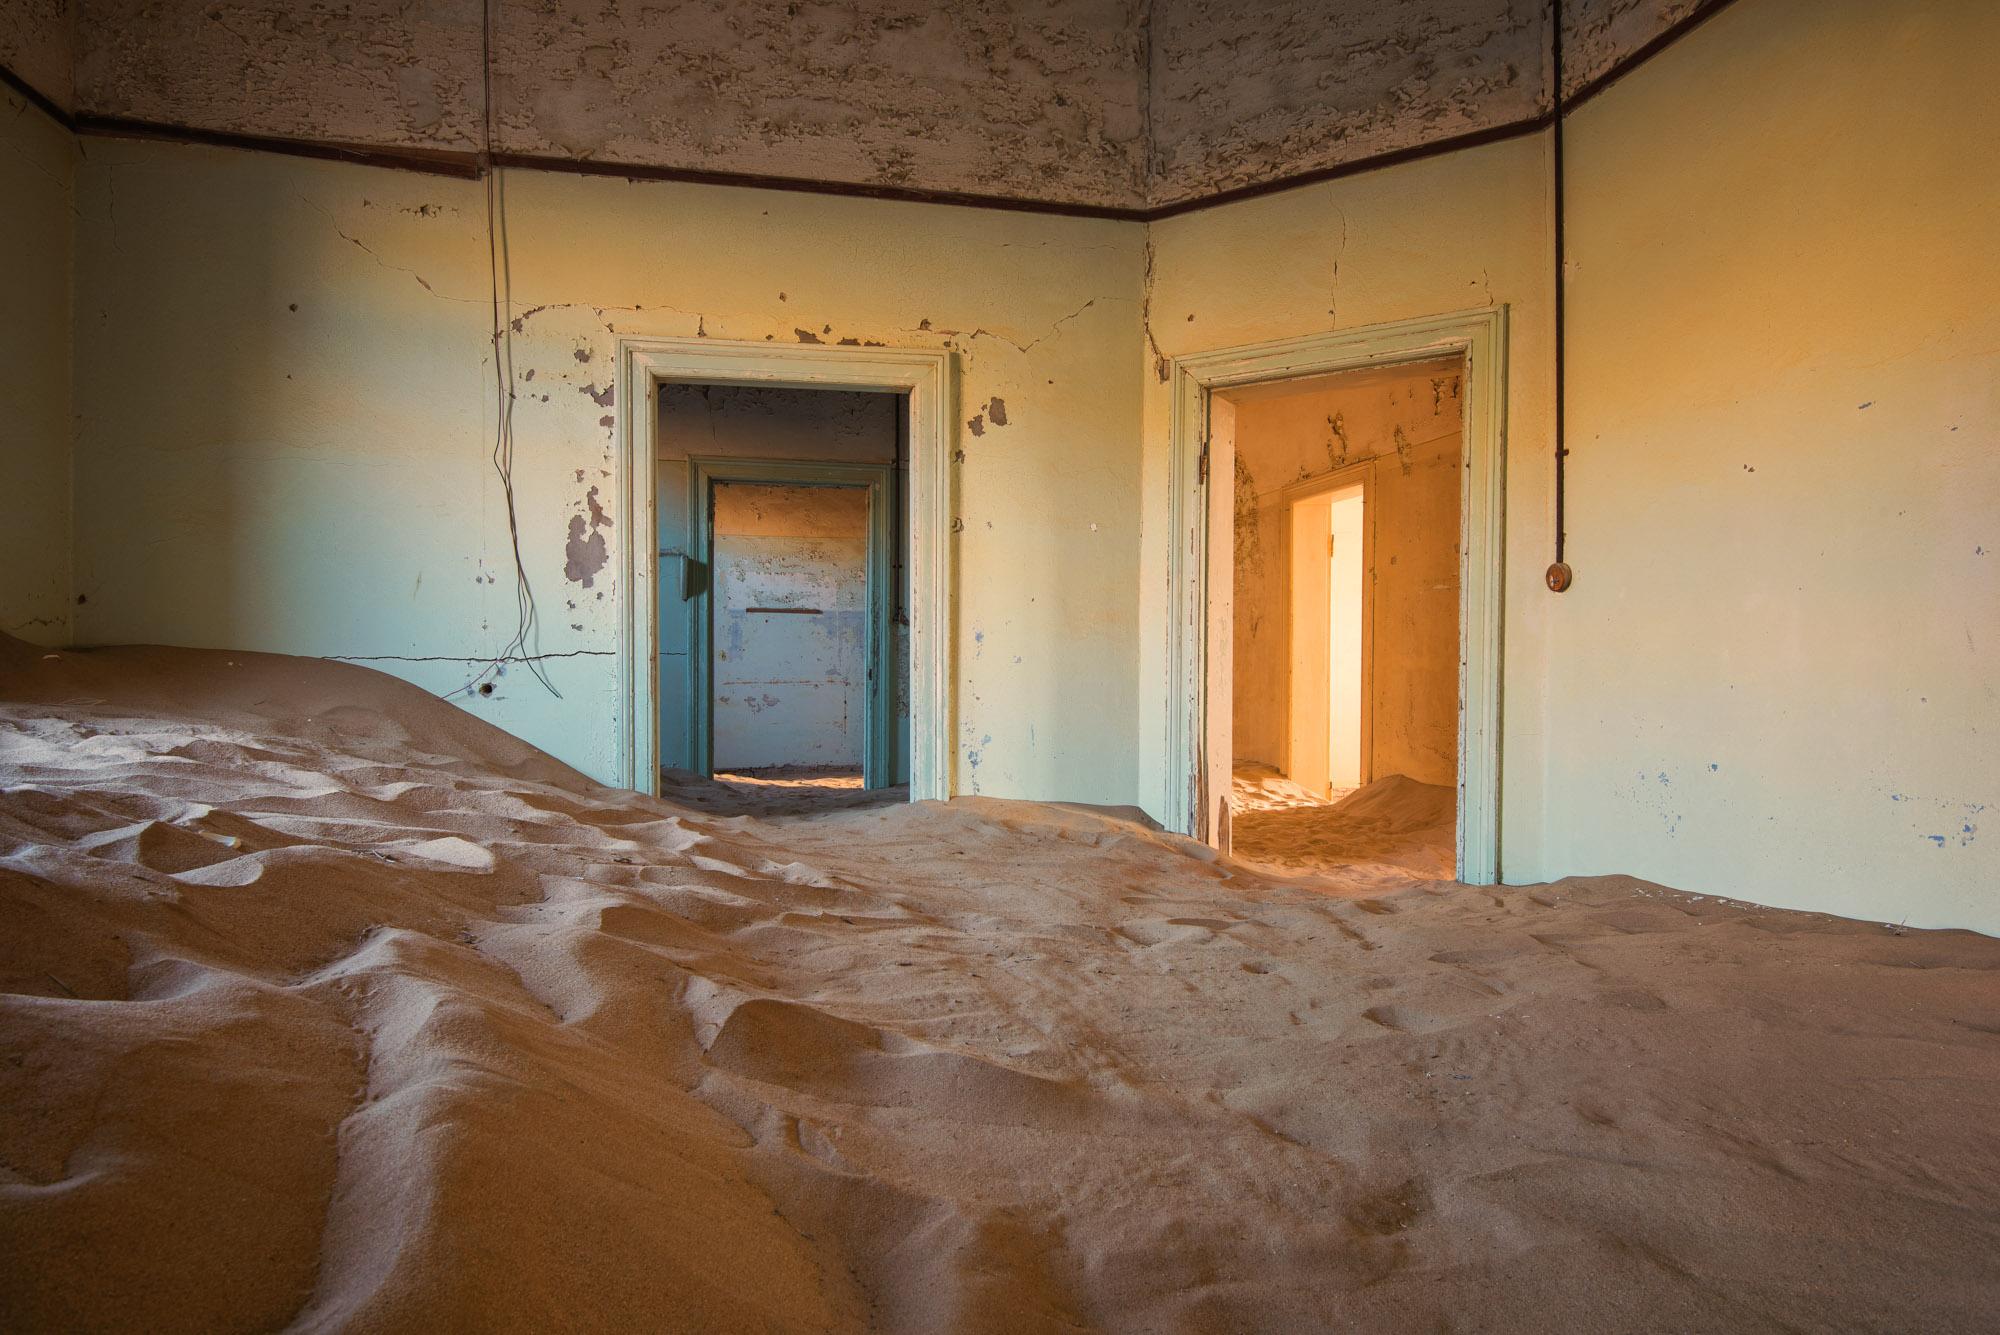 Sand Dunes inside an Abandoned House, Kolmanskop, Namibia